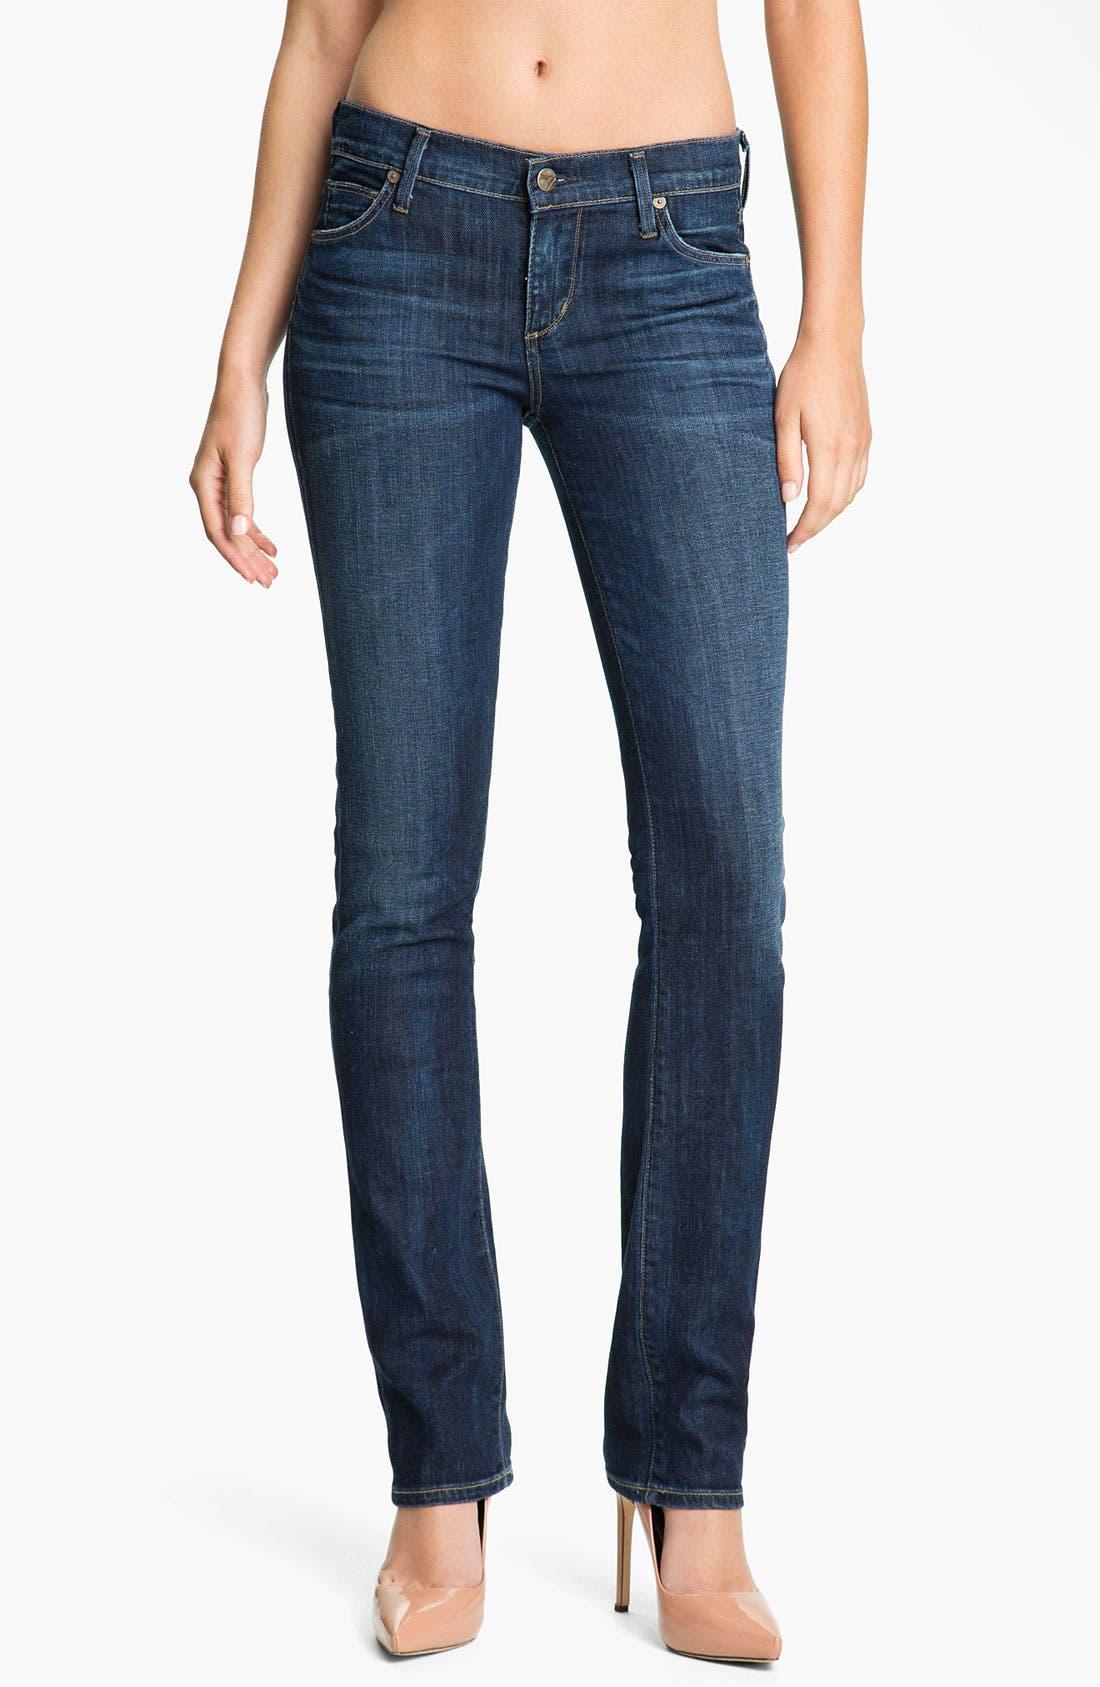 Main Image - Citizens of Humanity 'Ava' Straight Leg Stretch Denim Jeans (New Spectrum)